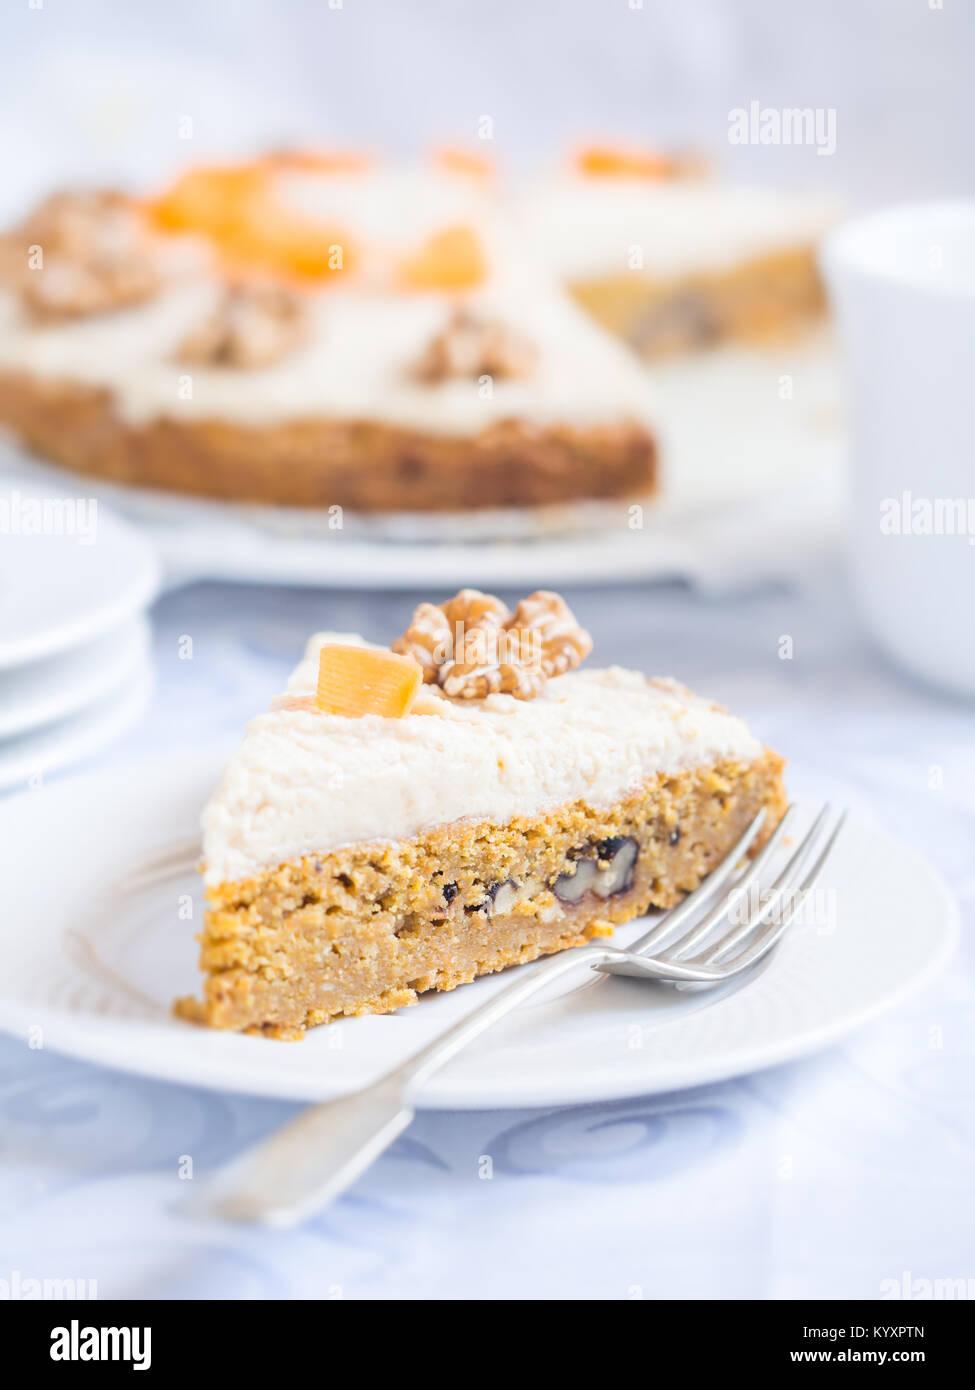 Slice of gluten-free carrot cake. - Stock Image